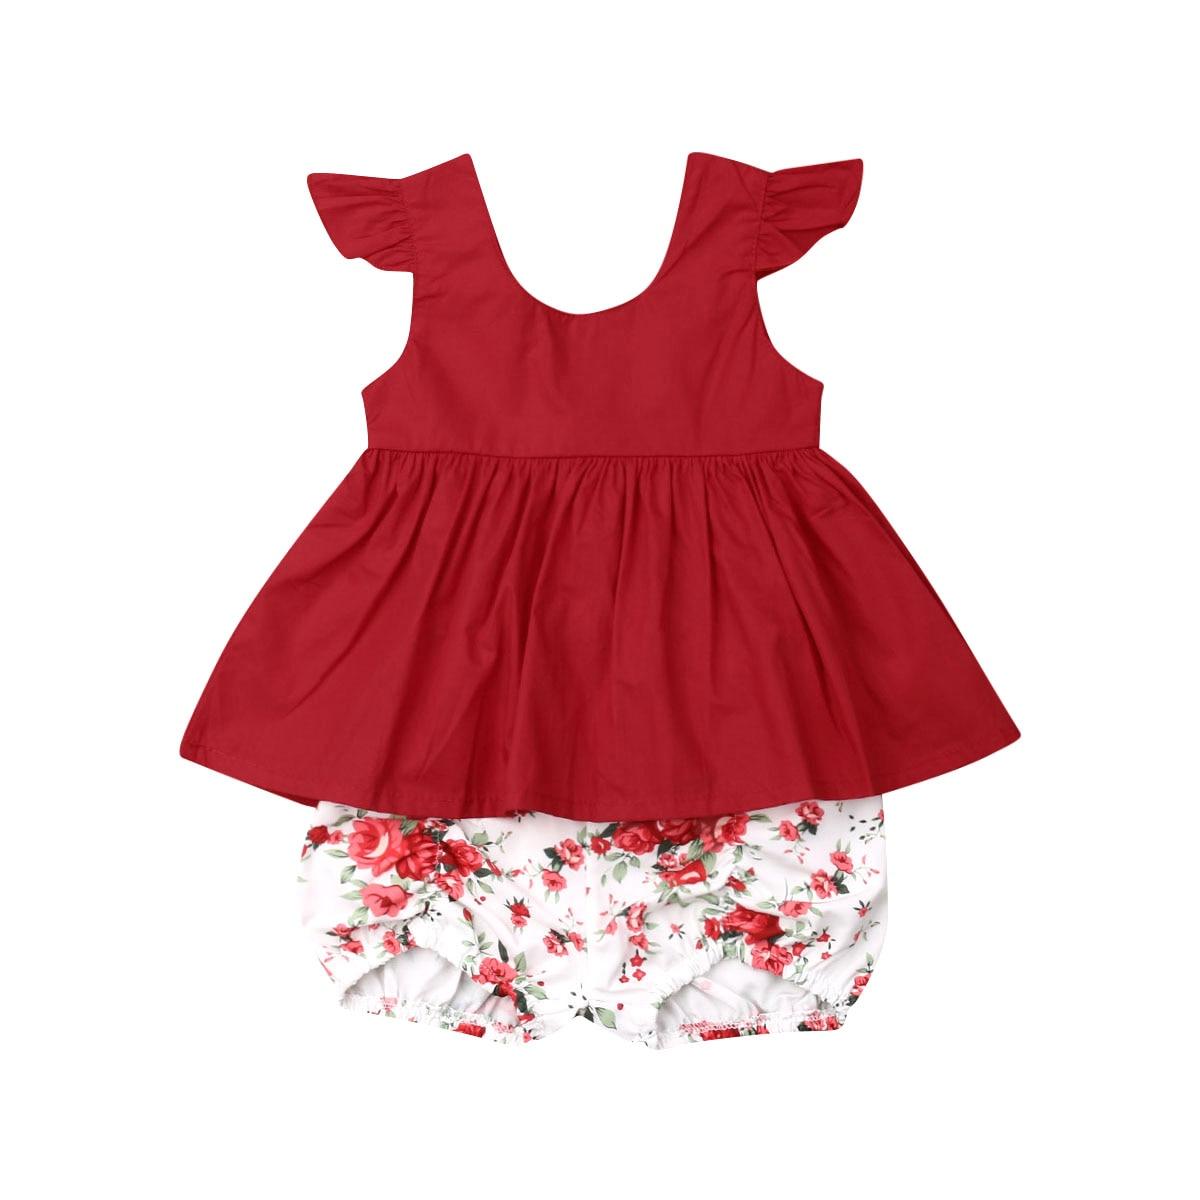 US 2PCS Toddler Kids Baby Girl Summer Clothes T-shirt Tops+Pants Shorts Outfits